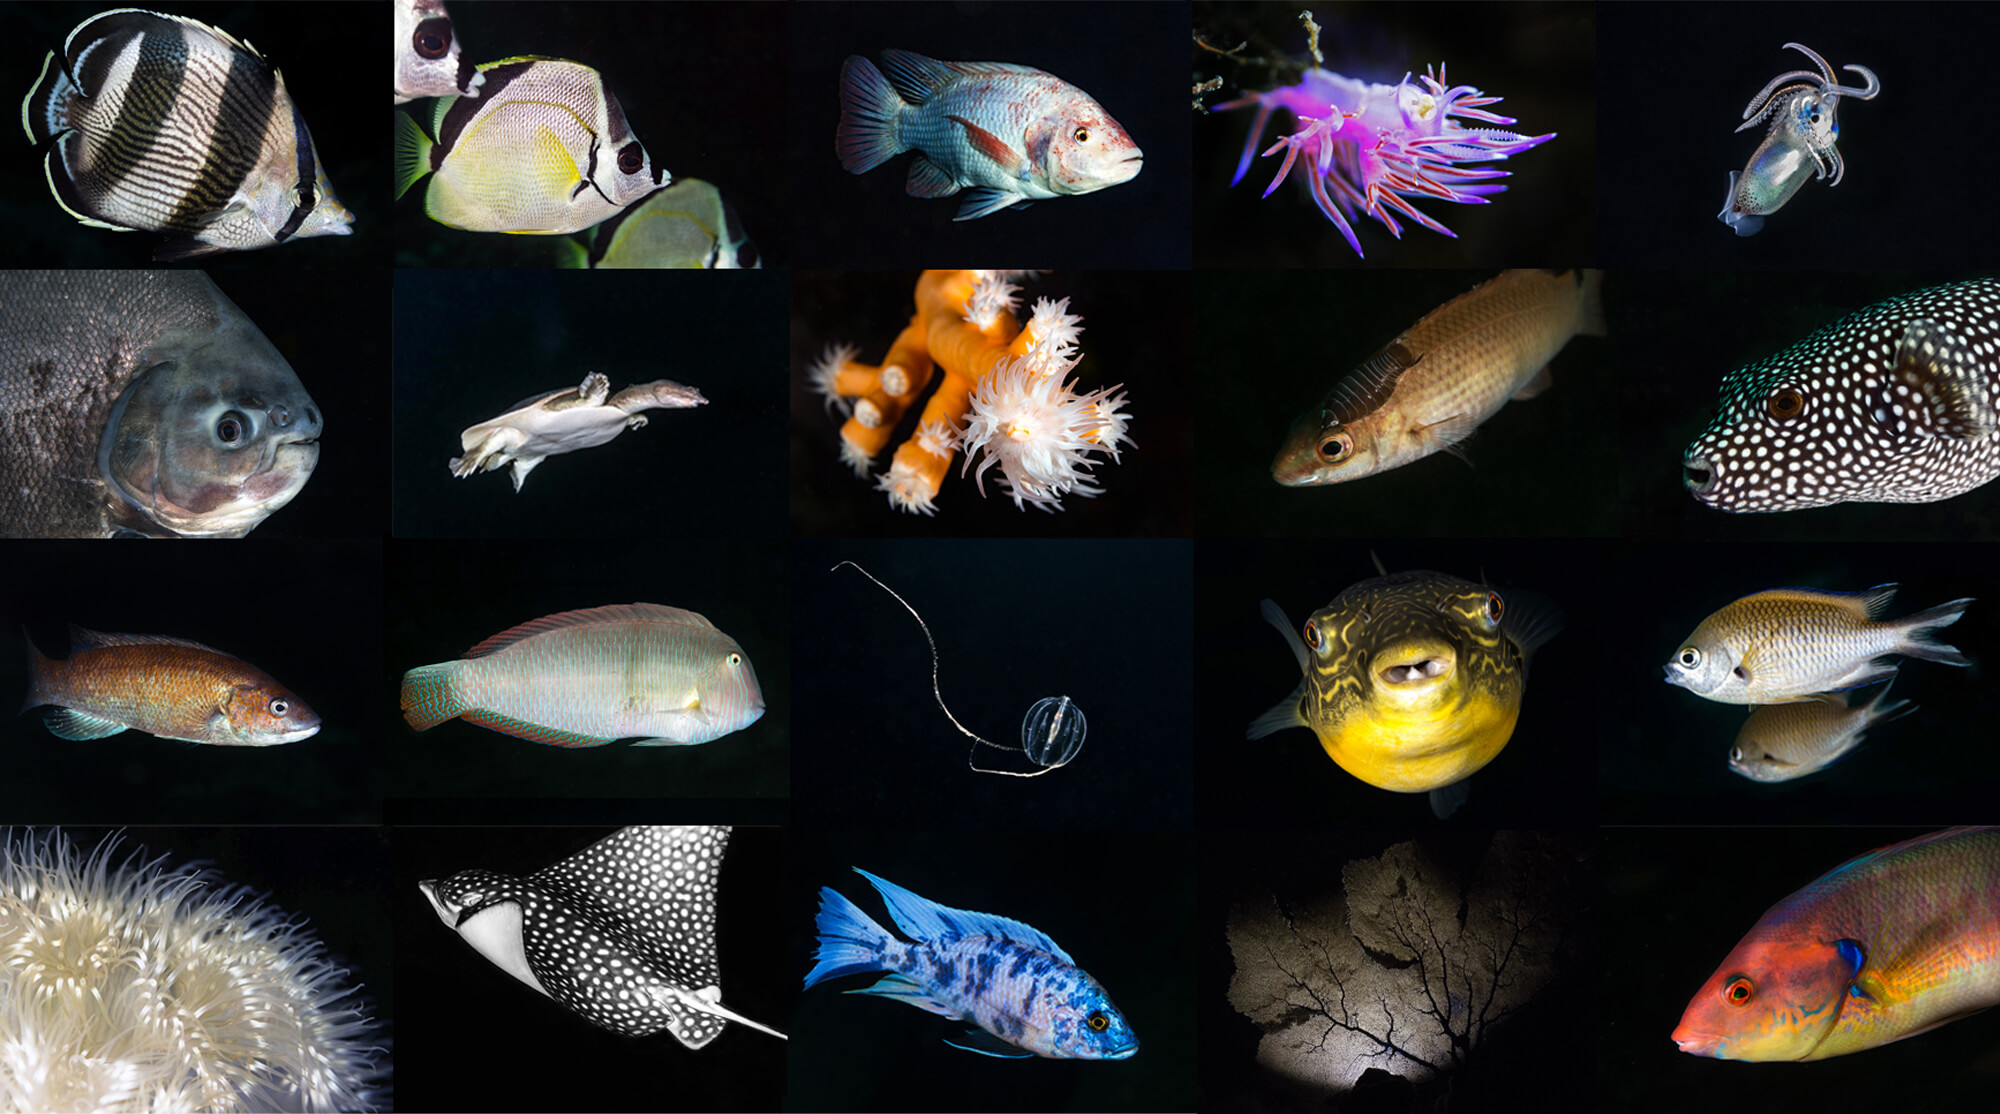 Species In The Spotlight Assortment Of Animals Image